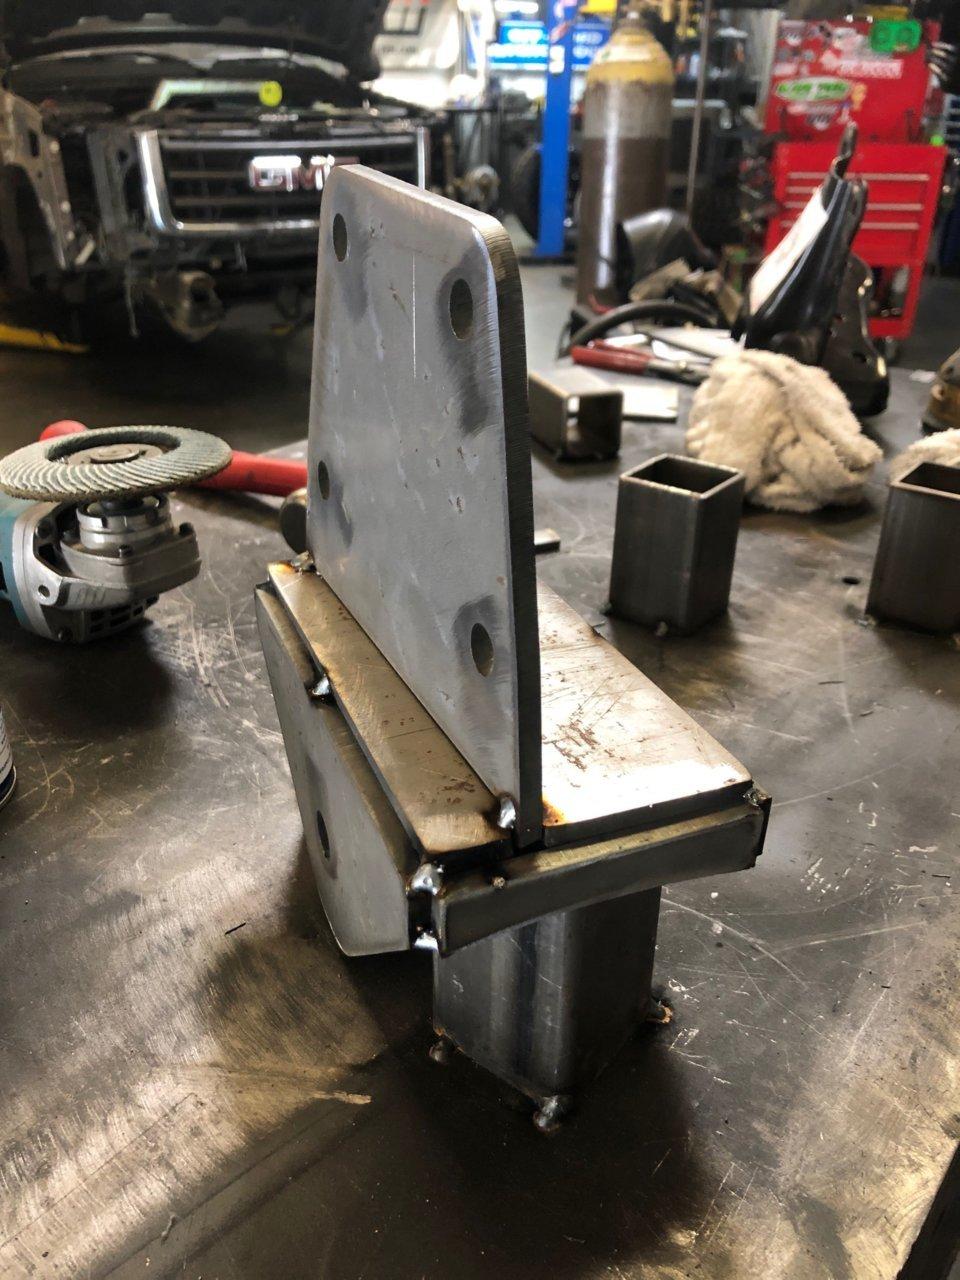 American Automotive Tundra 1-2 Rear Suspension Lift U Bolts 4PCS 10 Extra Long OEM Material